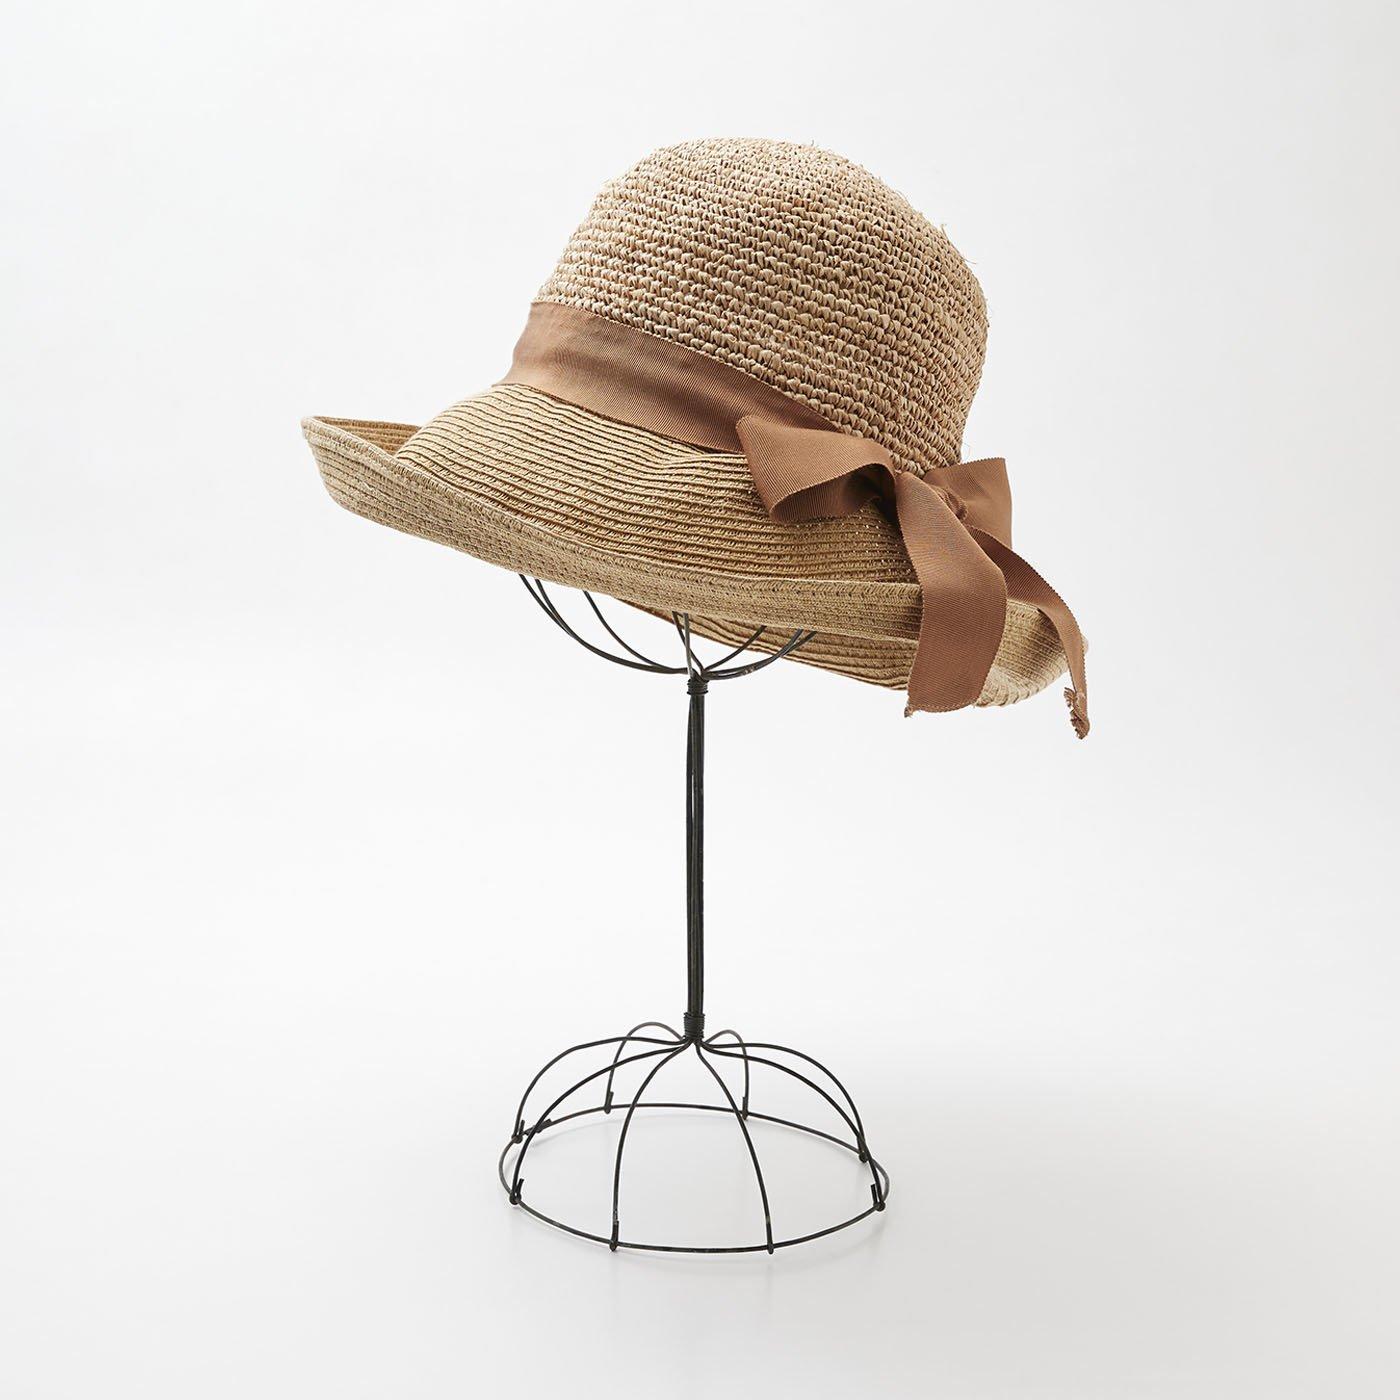 odds ラフィアとペーパーで作った帽子